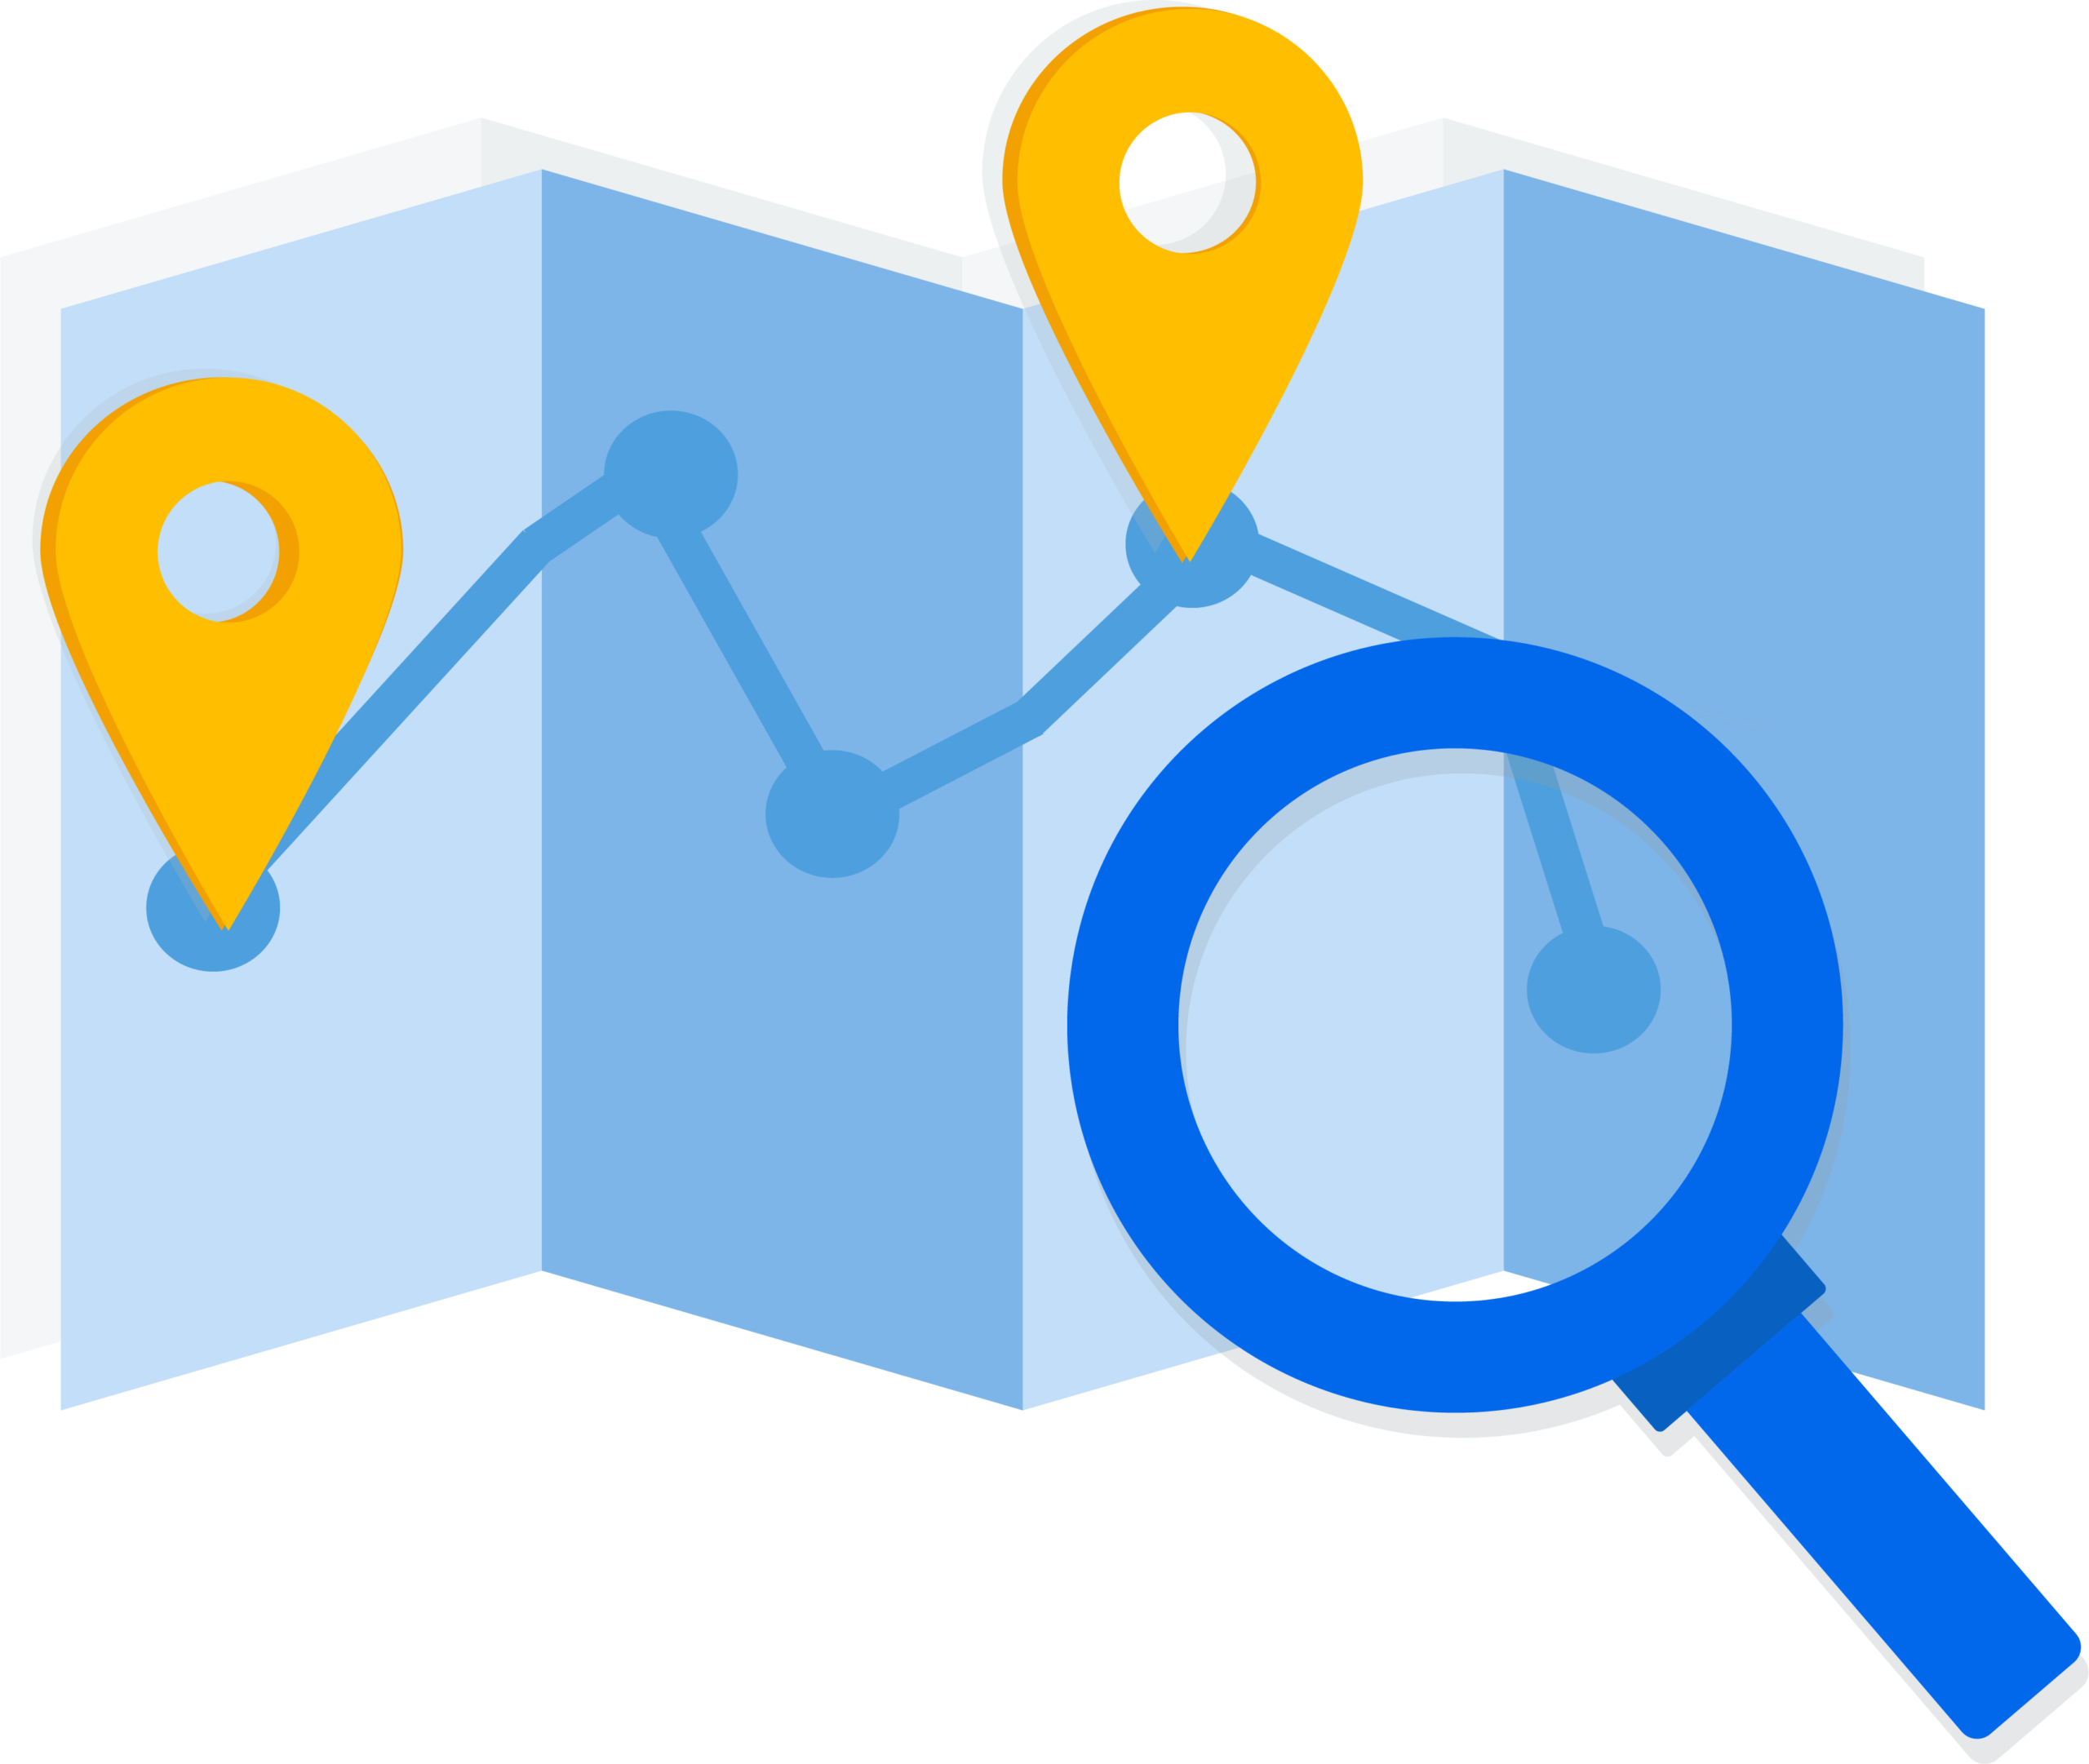 Location based analytics